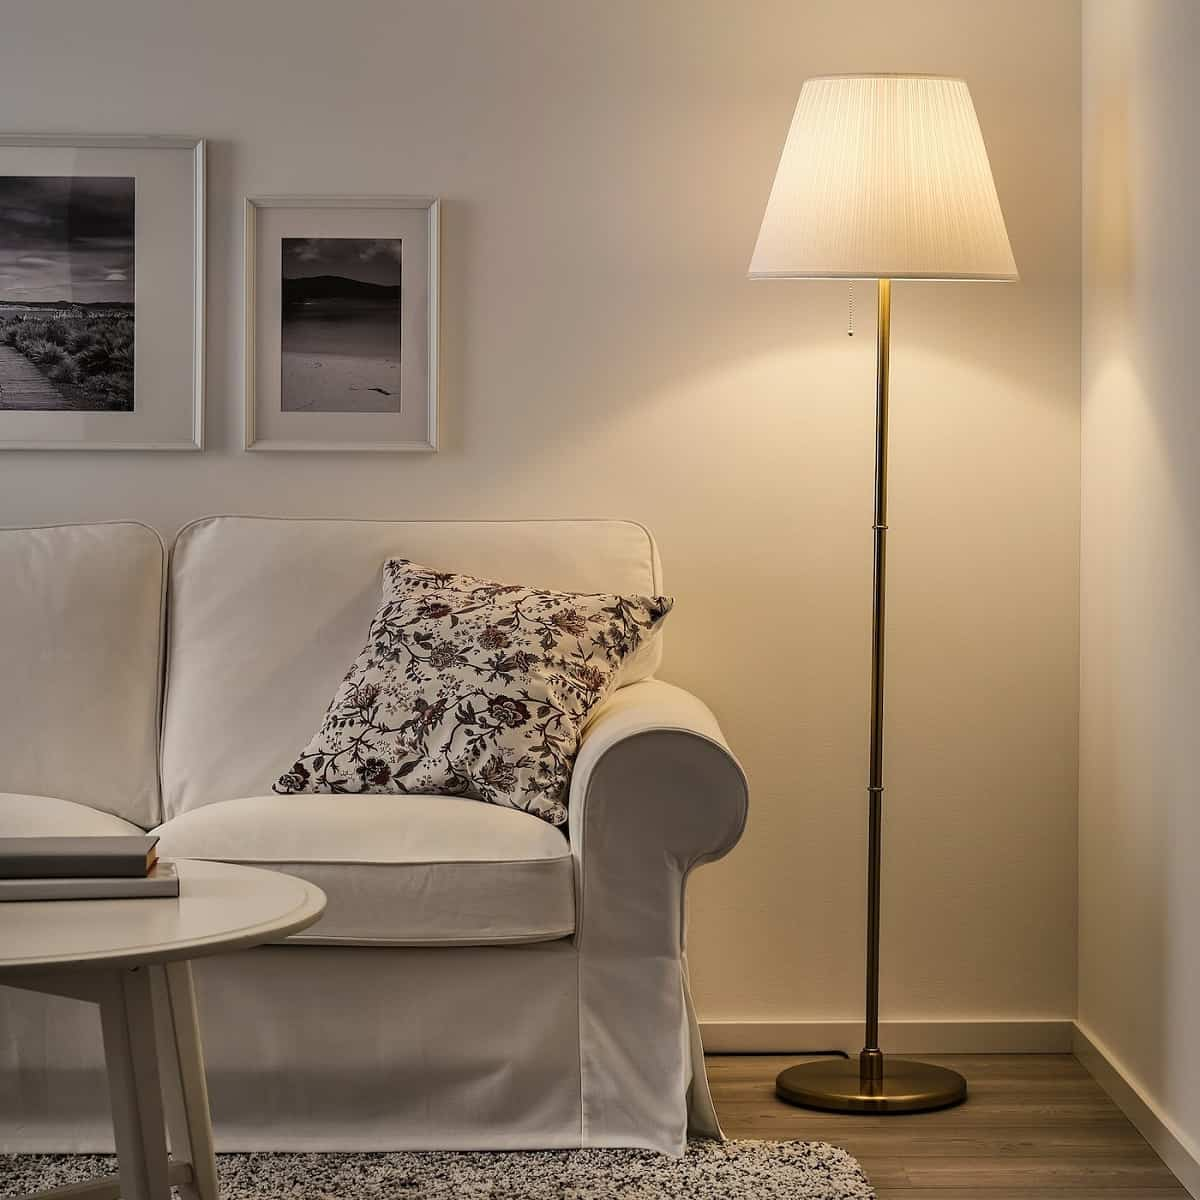 10 lamparas de pie de ikea para decorar tu hogar 9